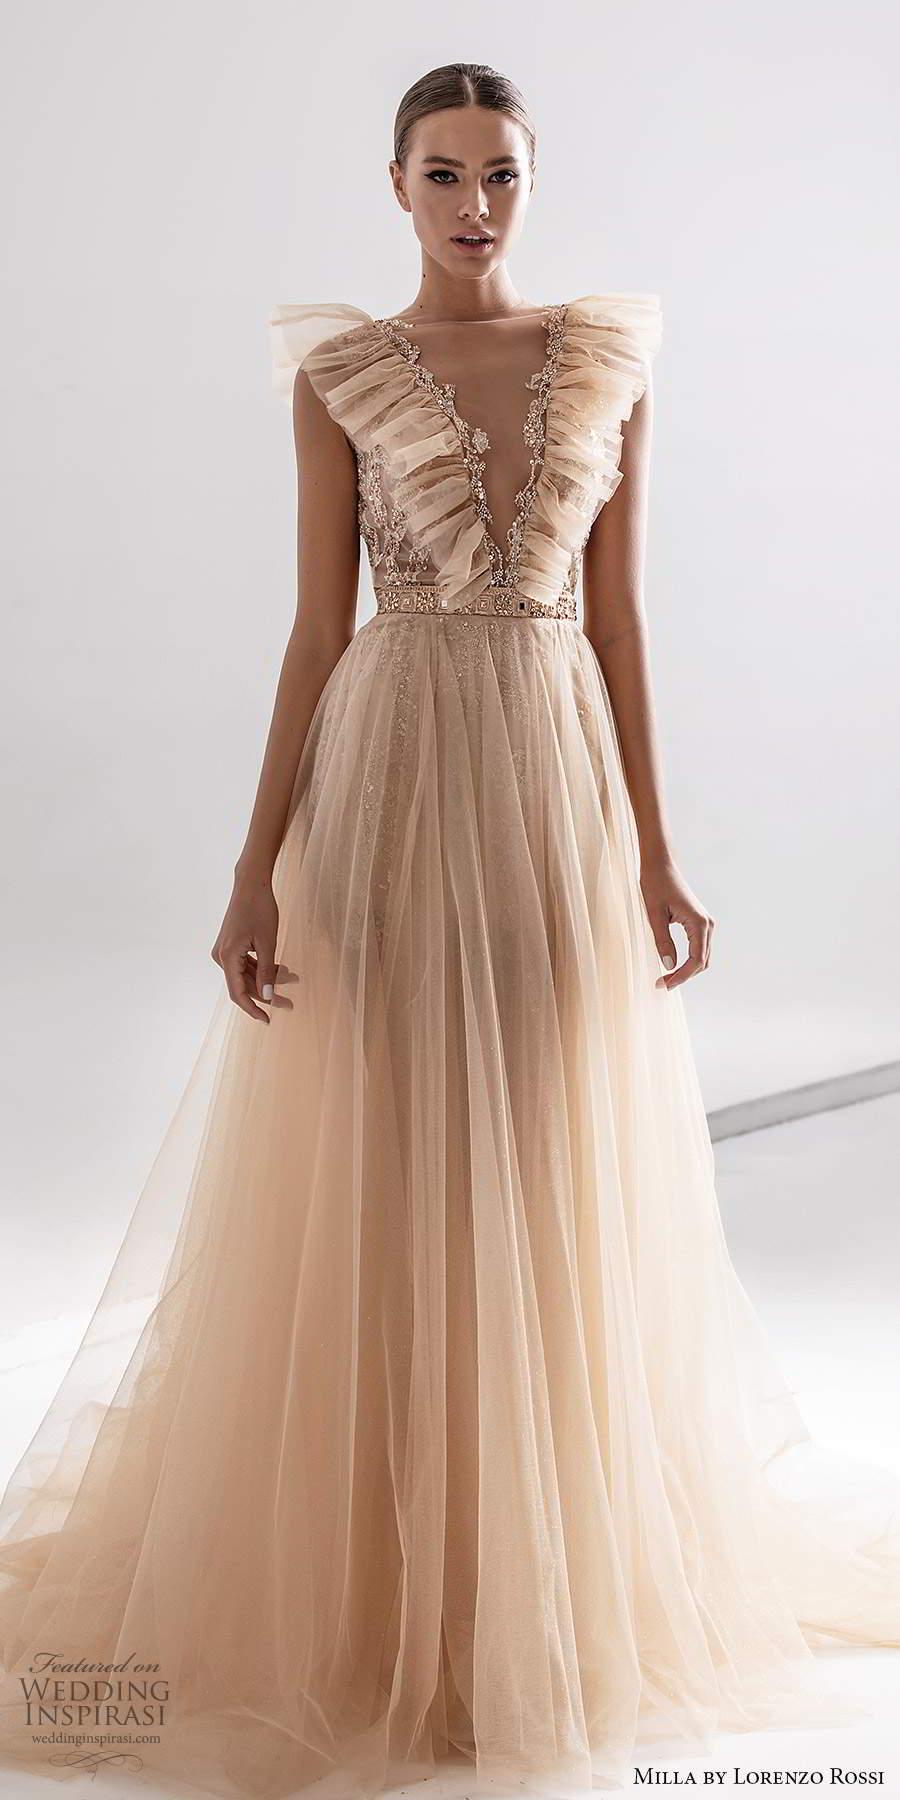 milla by lorenzo rossi 2020 rtw sleeveless ruffle straps plunging v neckline fully embellished a line ball gown wedding dress blush champagne (1) mv